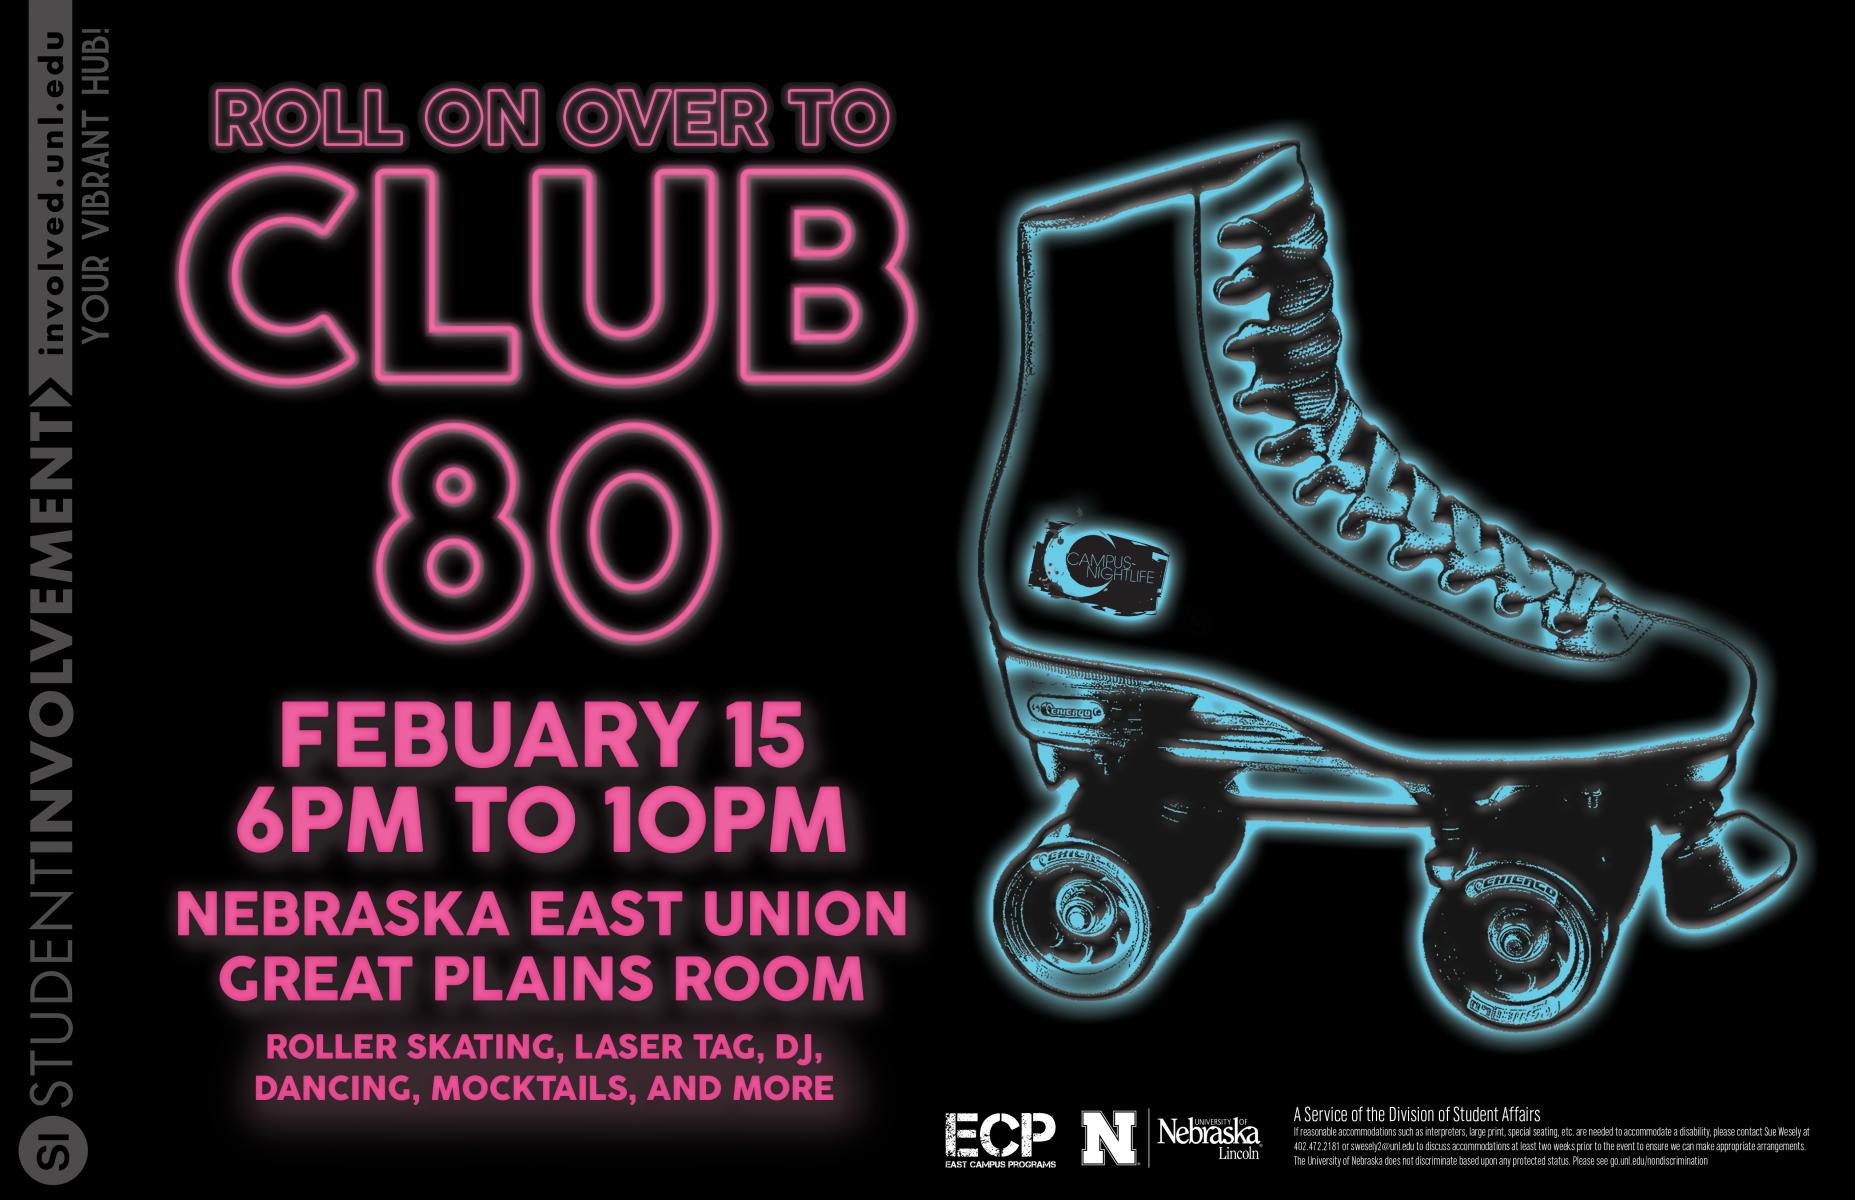 Club 80 Event Flier